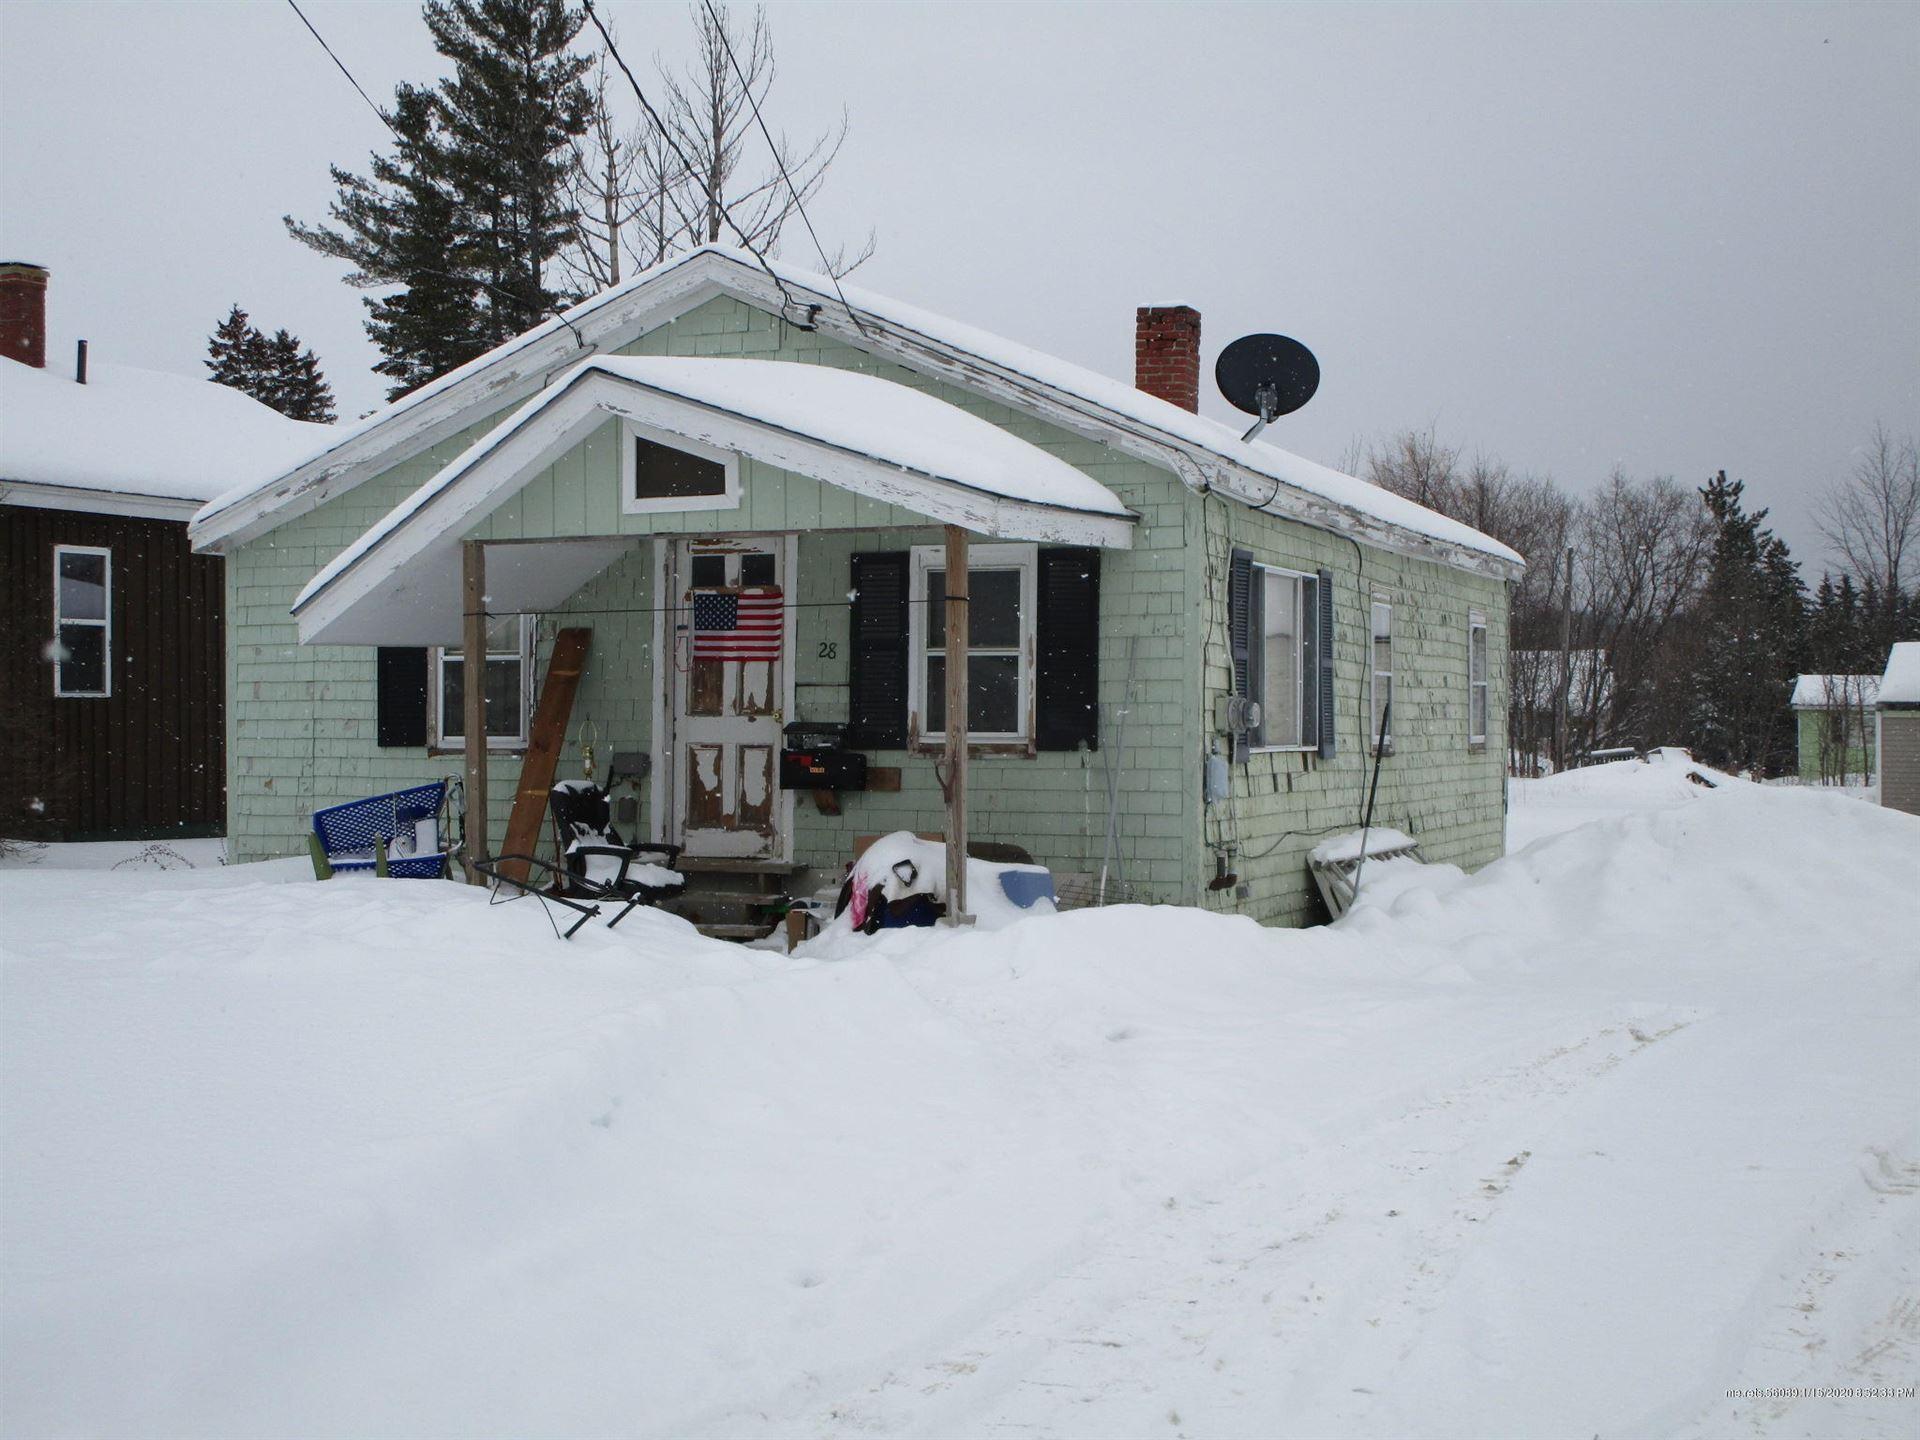 Photo of 28 Howard Street, Presque Isle, ME 04769 (MLS # 1442519)